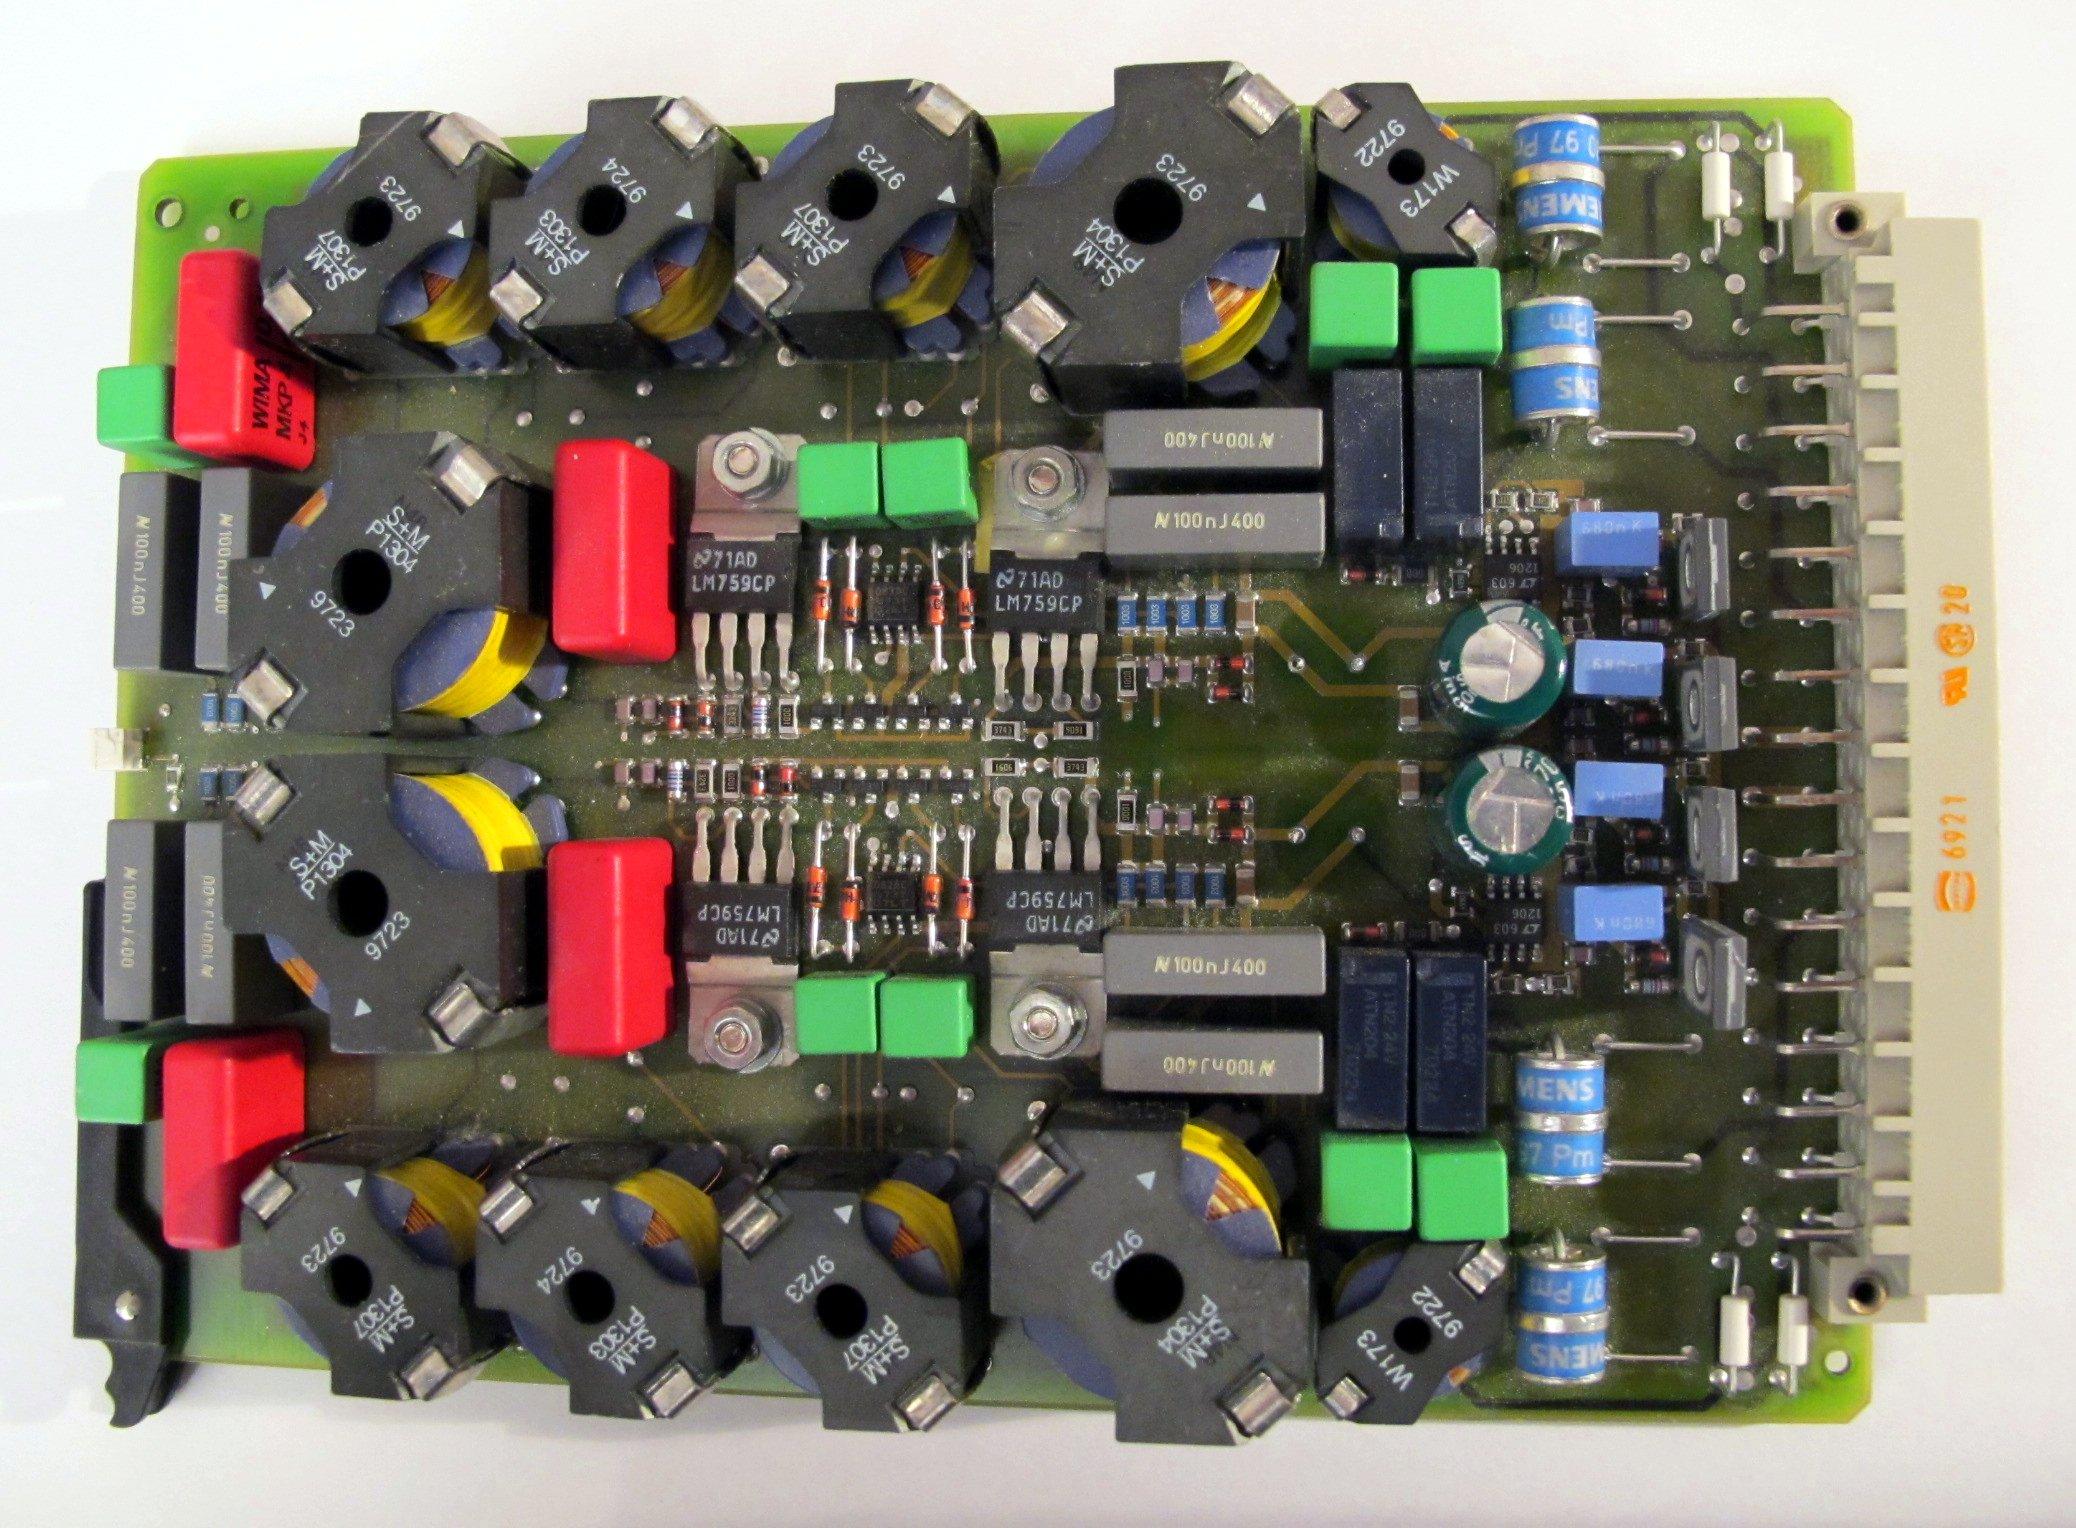 Eurocard Printed Circuit Board Wikipedia How Do You Make A